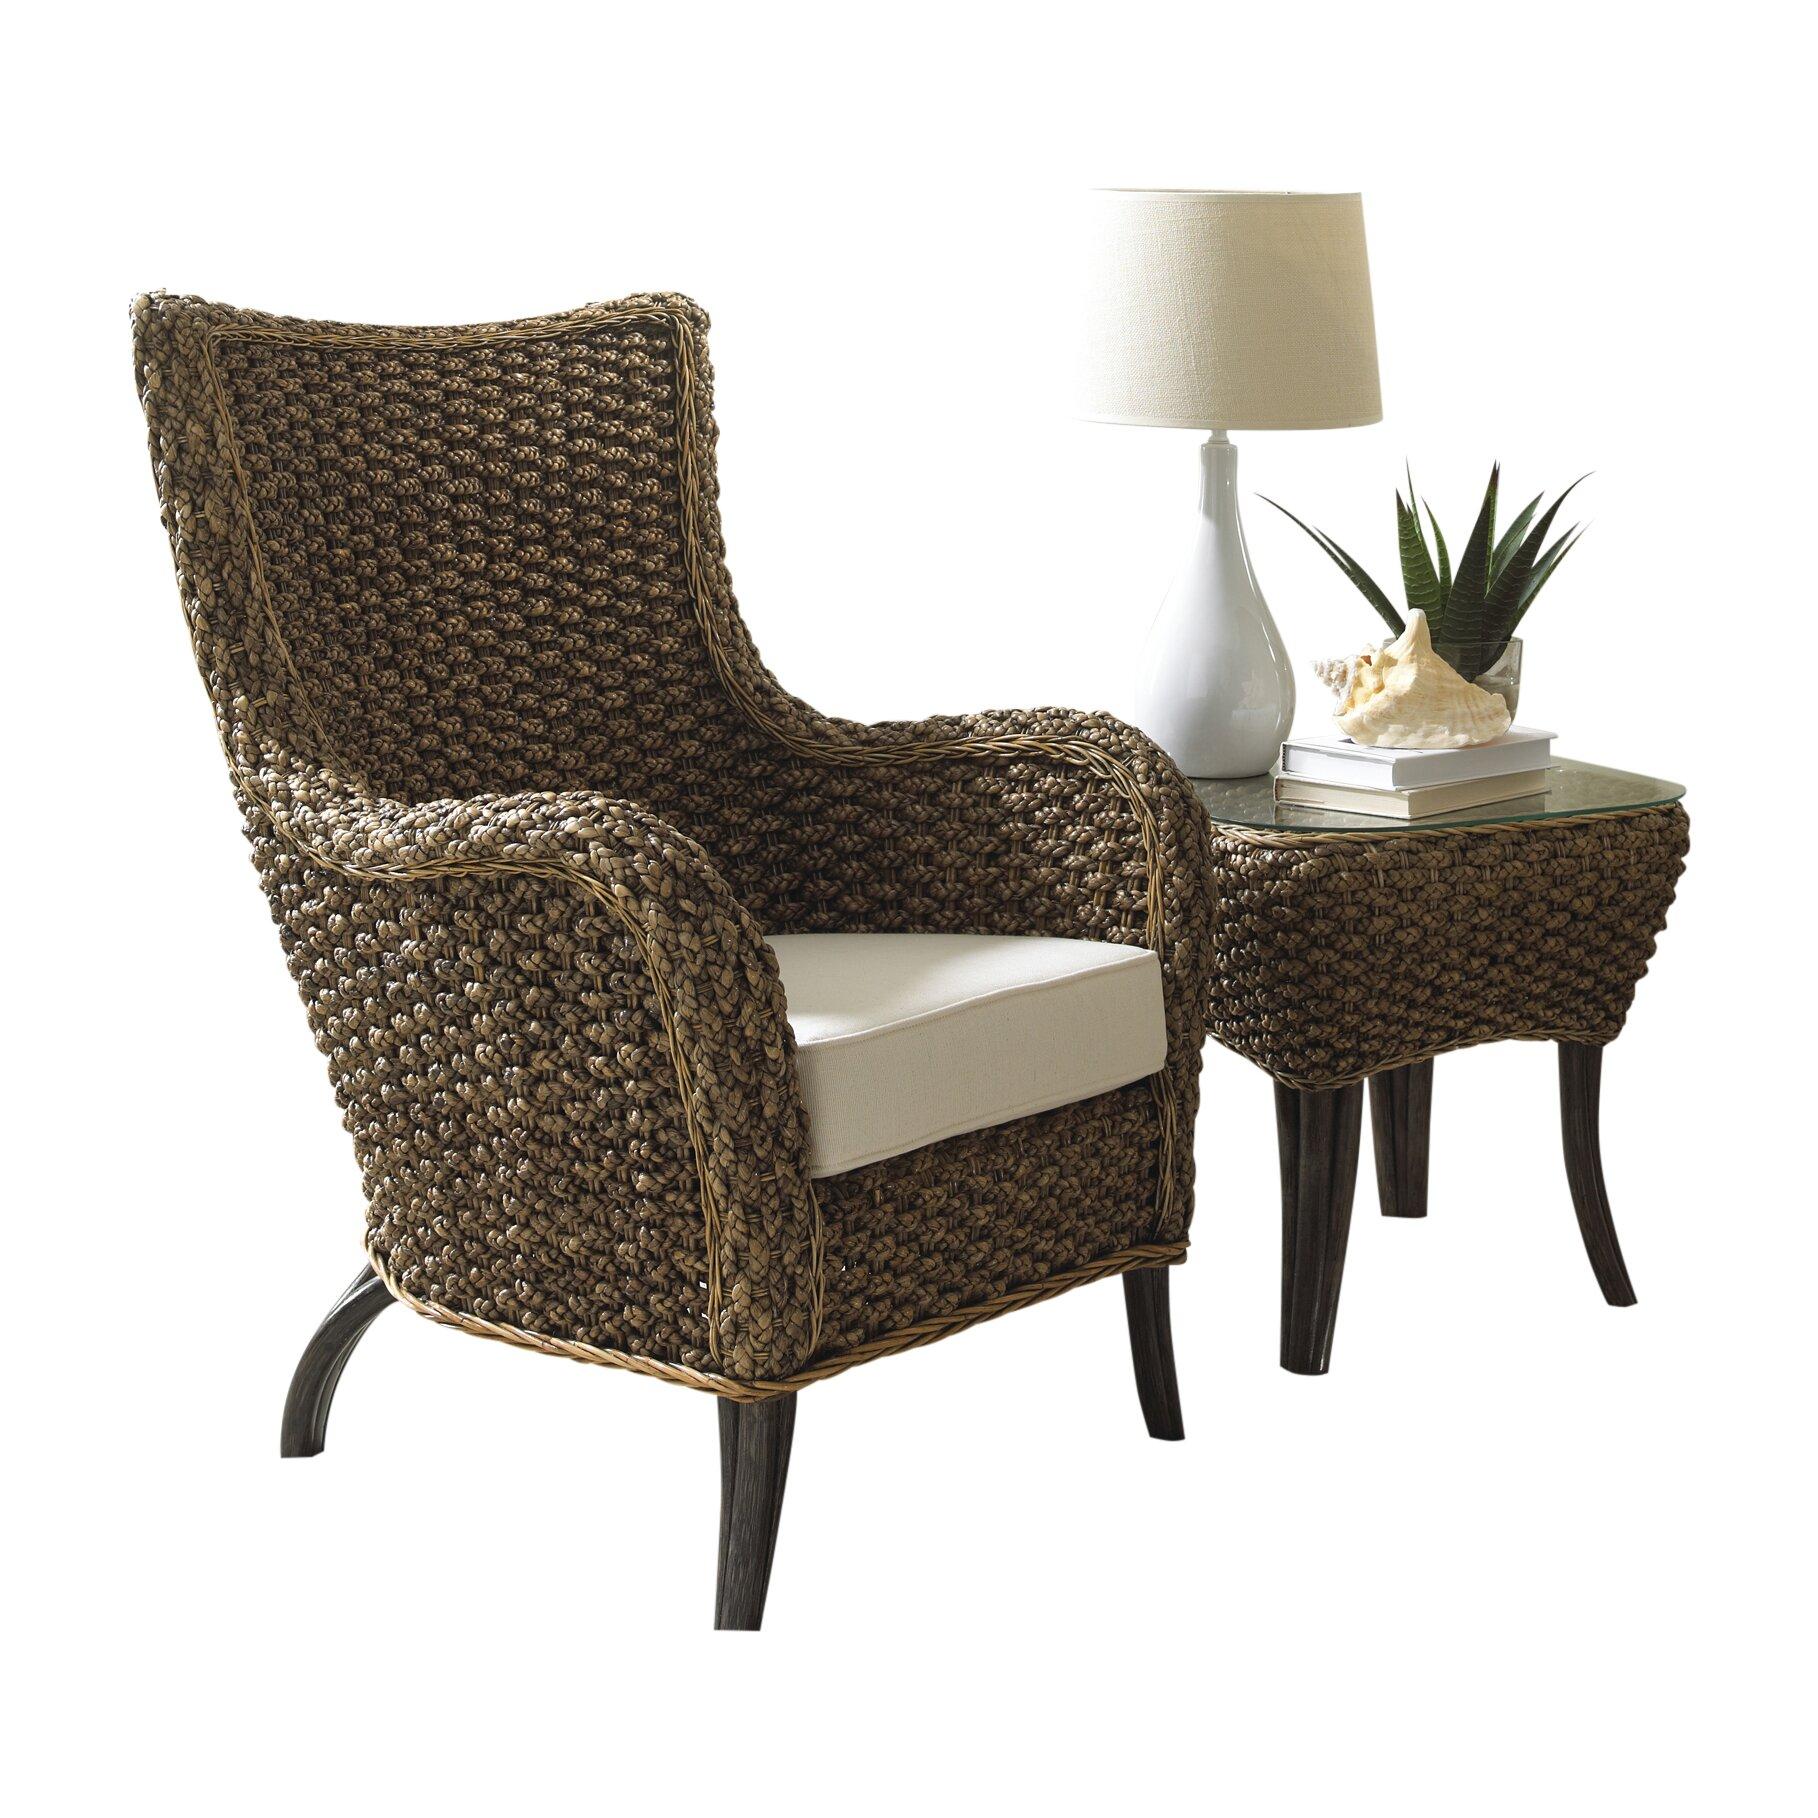 Furniture stores panama city beach fl - Furniture Stores In Panama City Fl Panama Jack Sunroom Sanibel 2 Piece Lounge Chair Set Amp